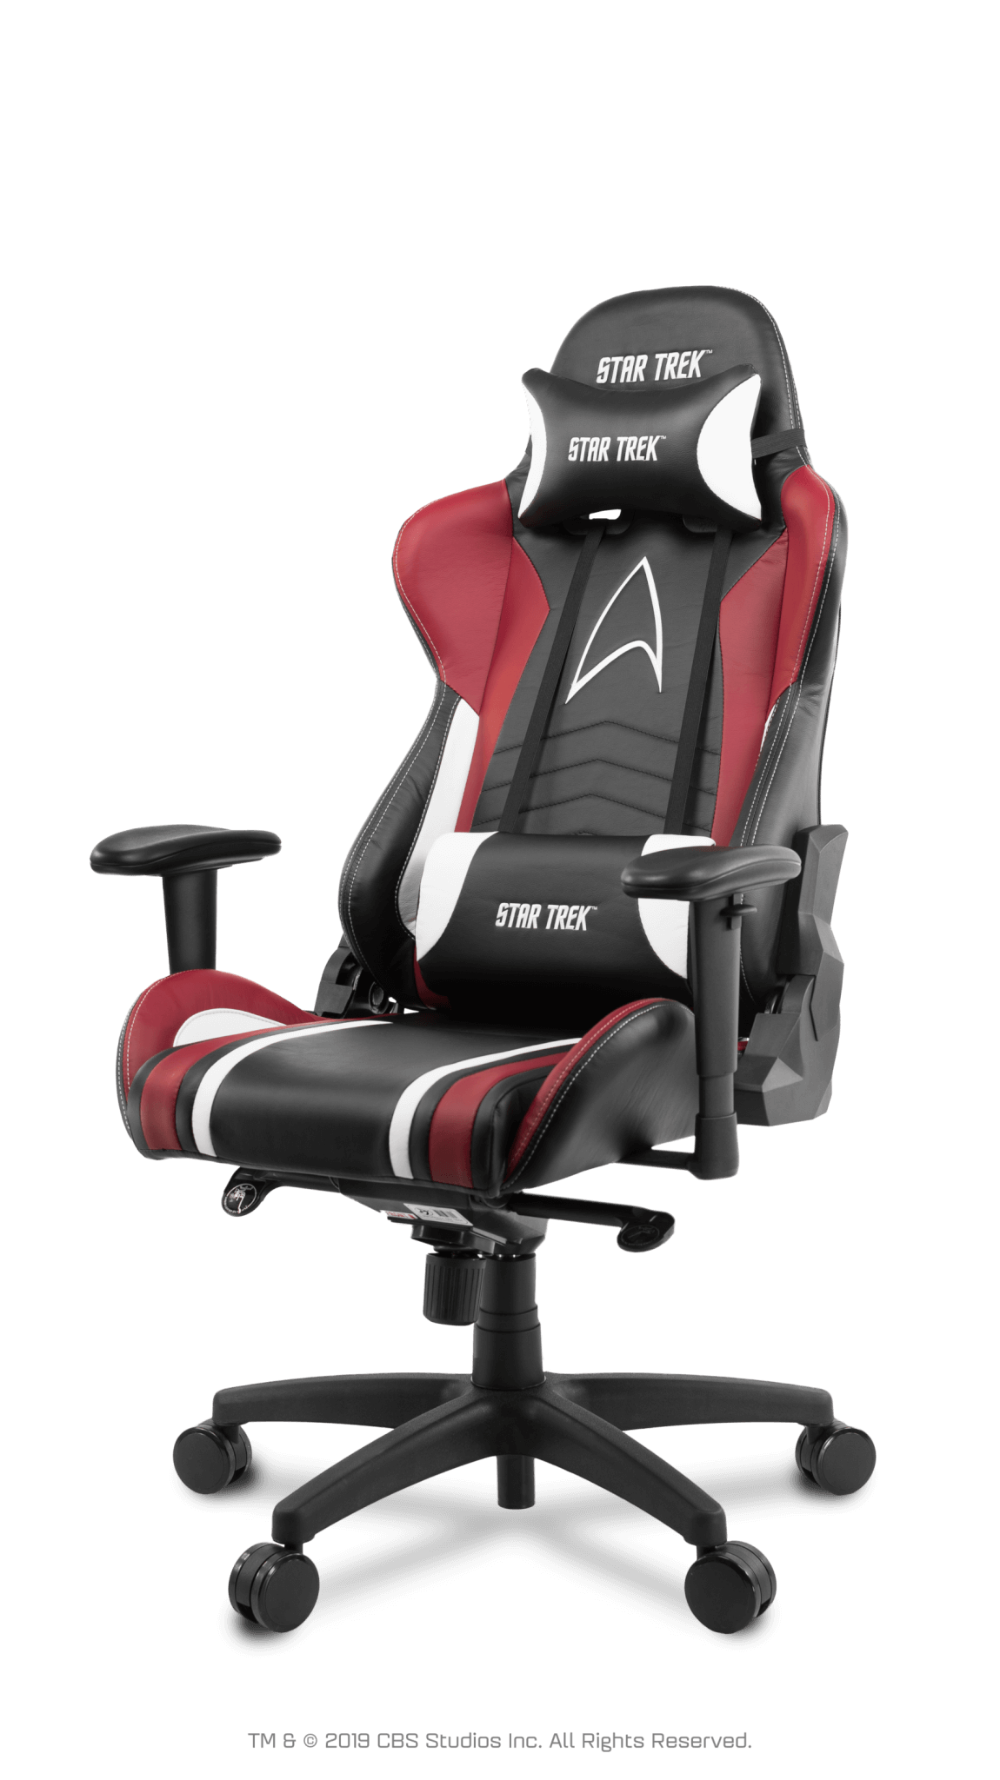 Yefk Ekul Ztp Google Poisk Gaming Chair Chair Perfect Chair